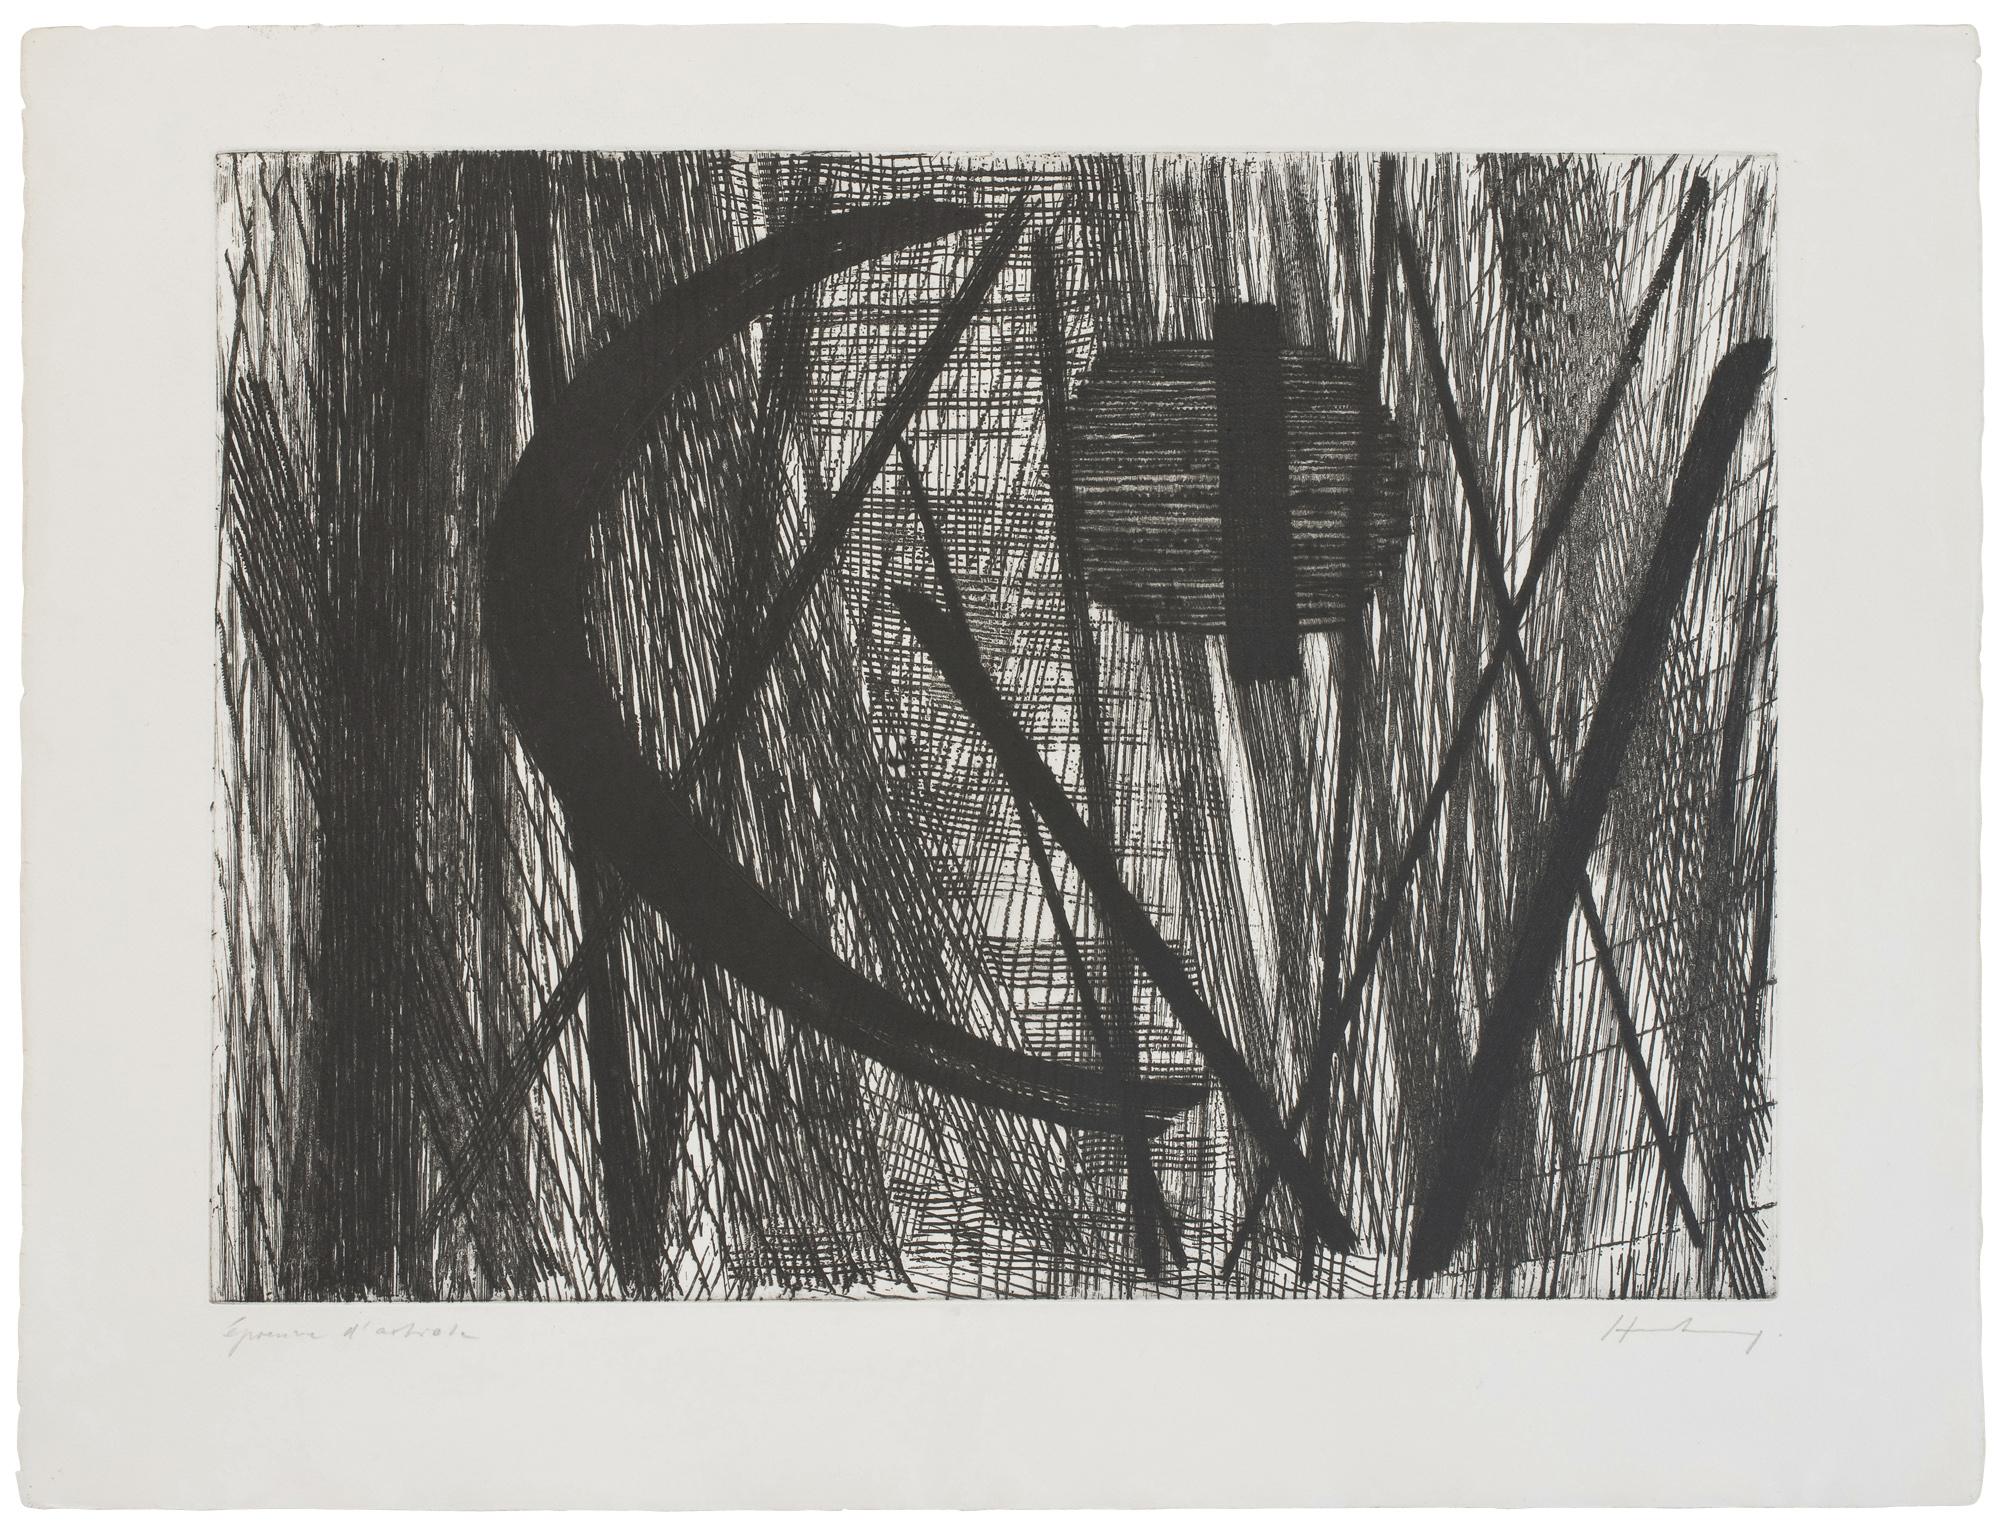 hans hartung - etching g 11 1953